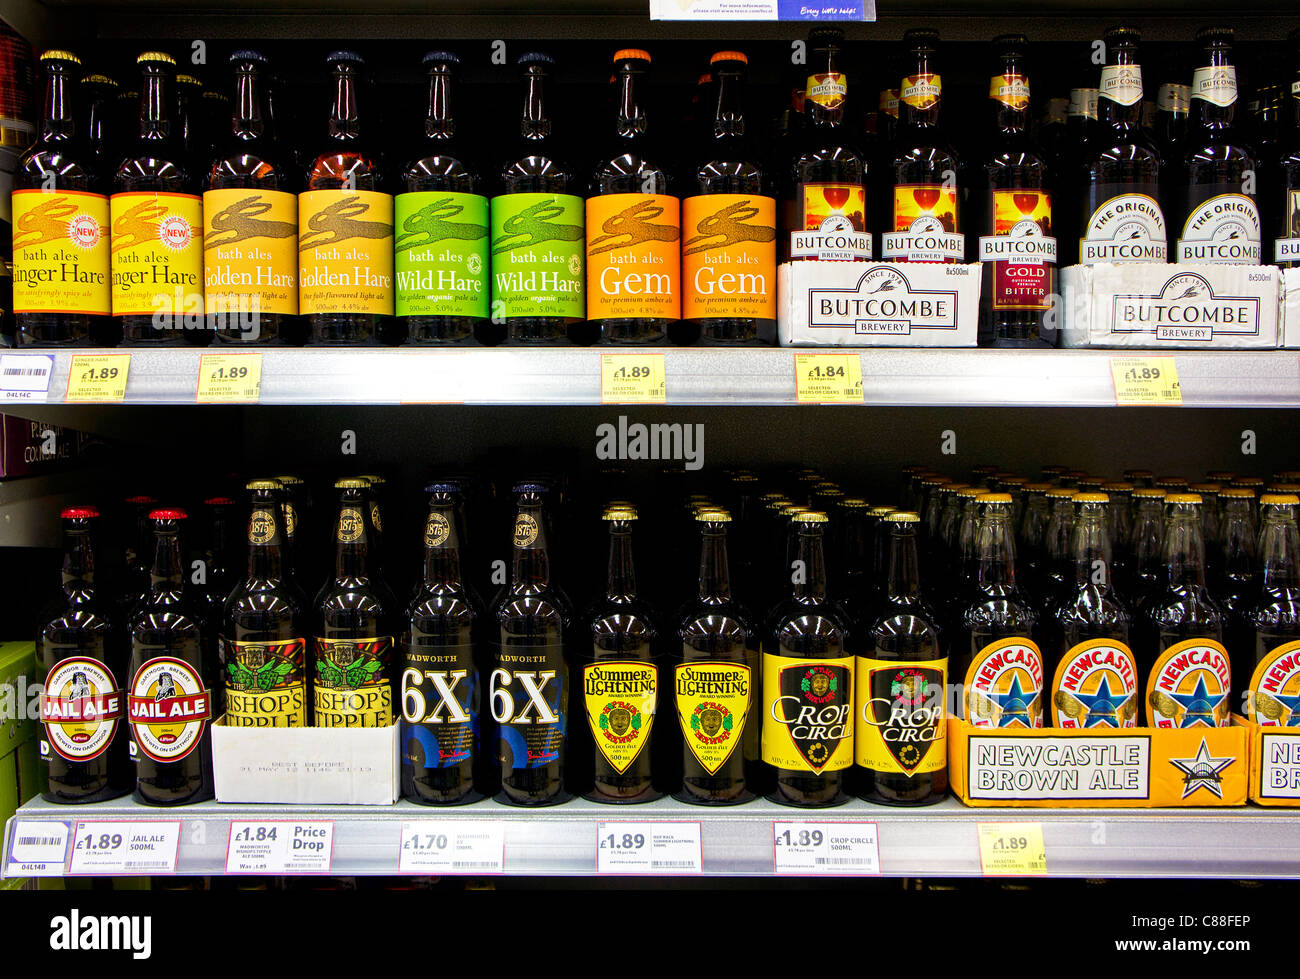 Bottles of premium beers in a UK supermarket - Stock Image